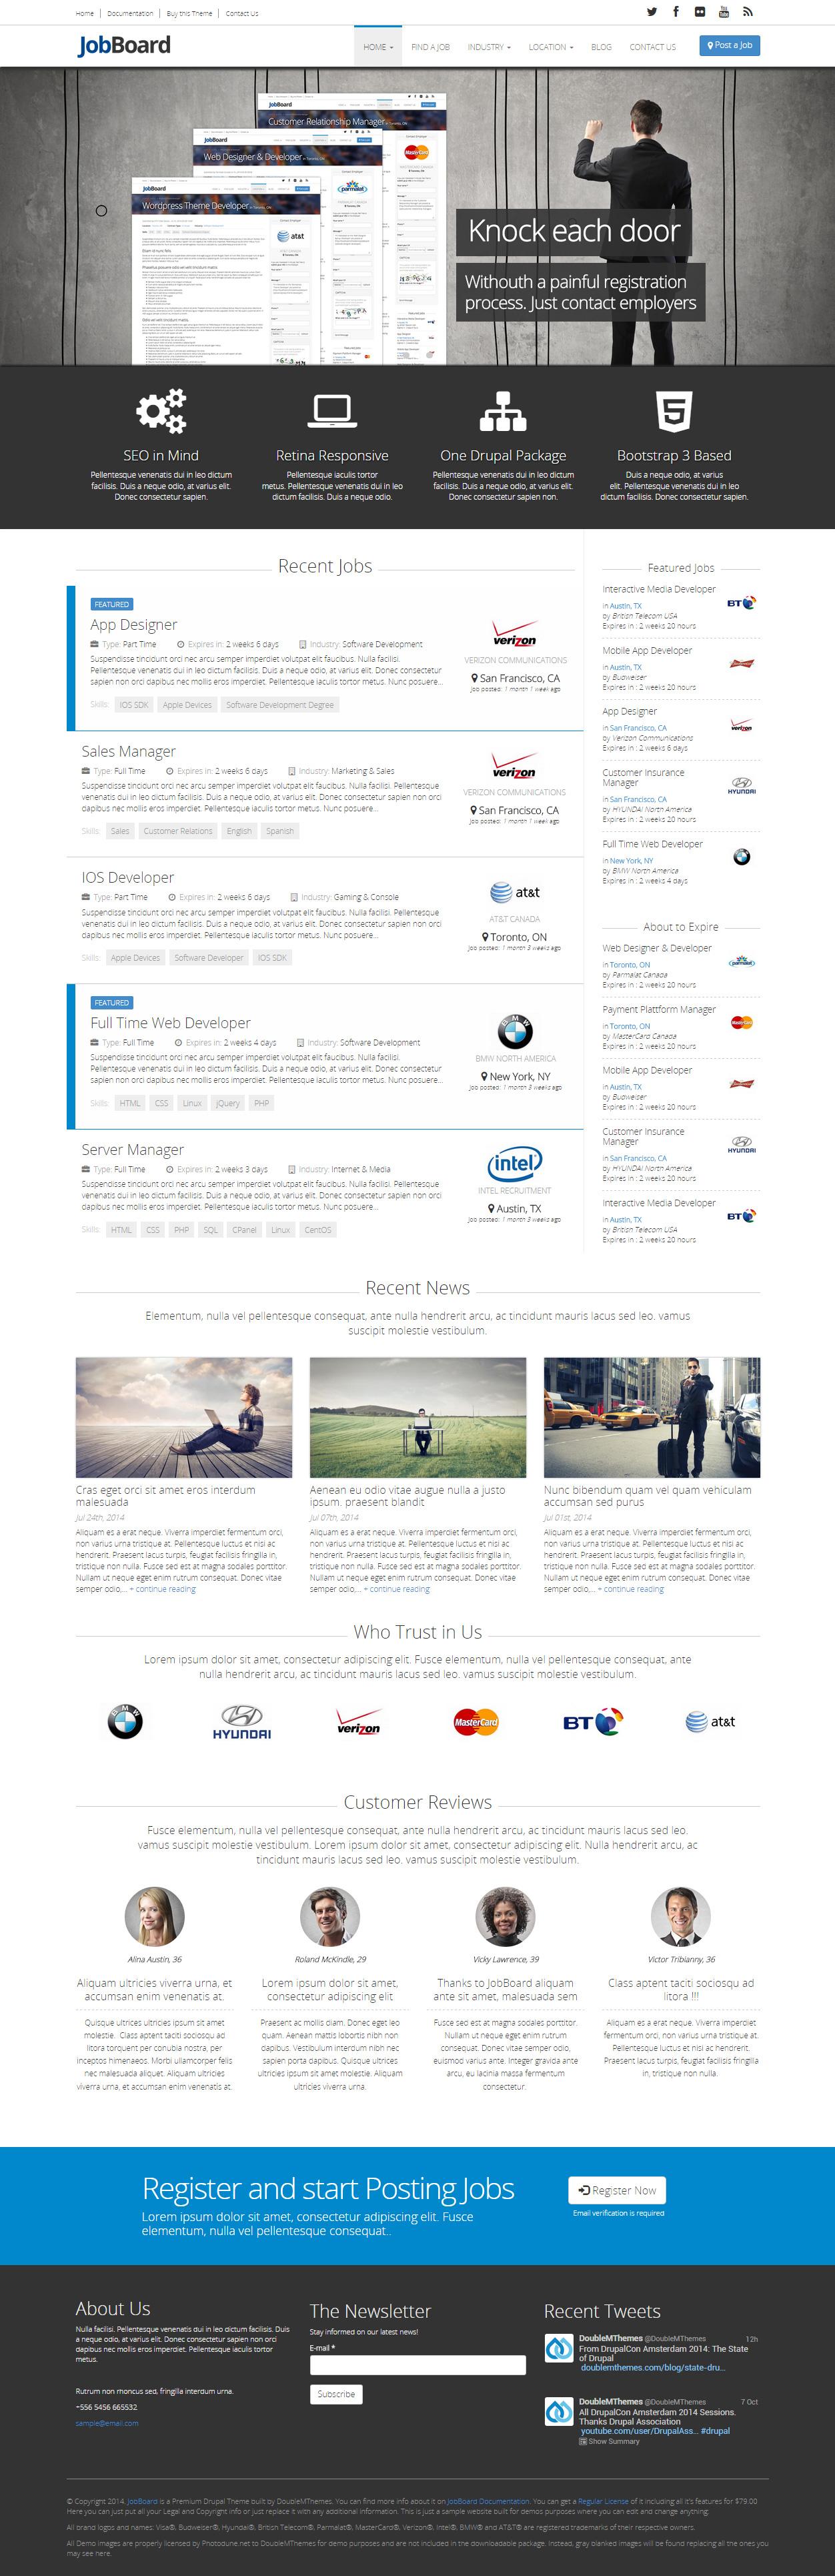 JobBoard - Premium Responsive Retina Drupal Job Board Theme